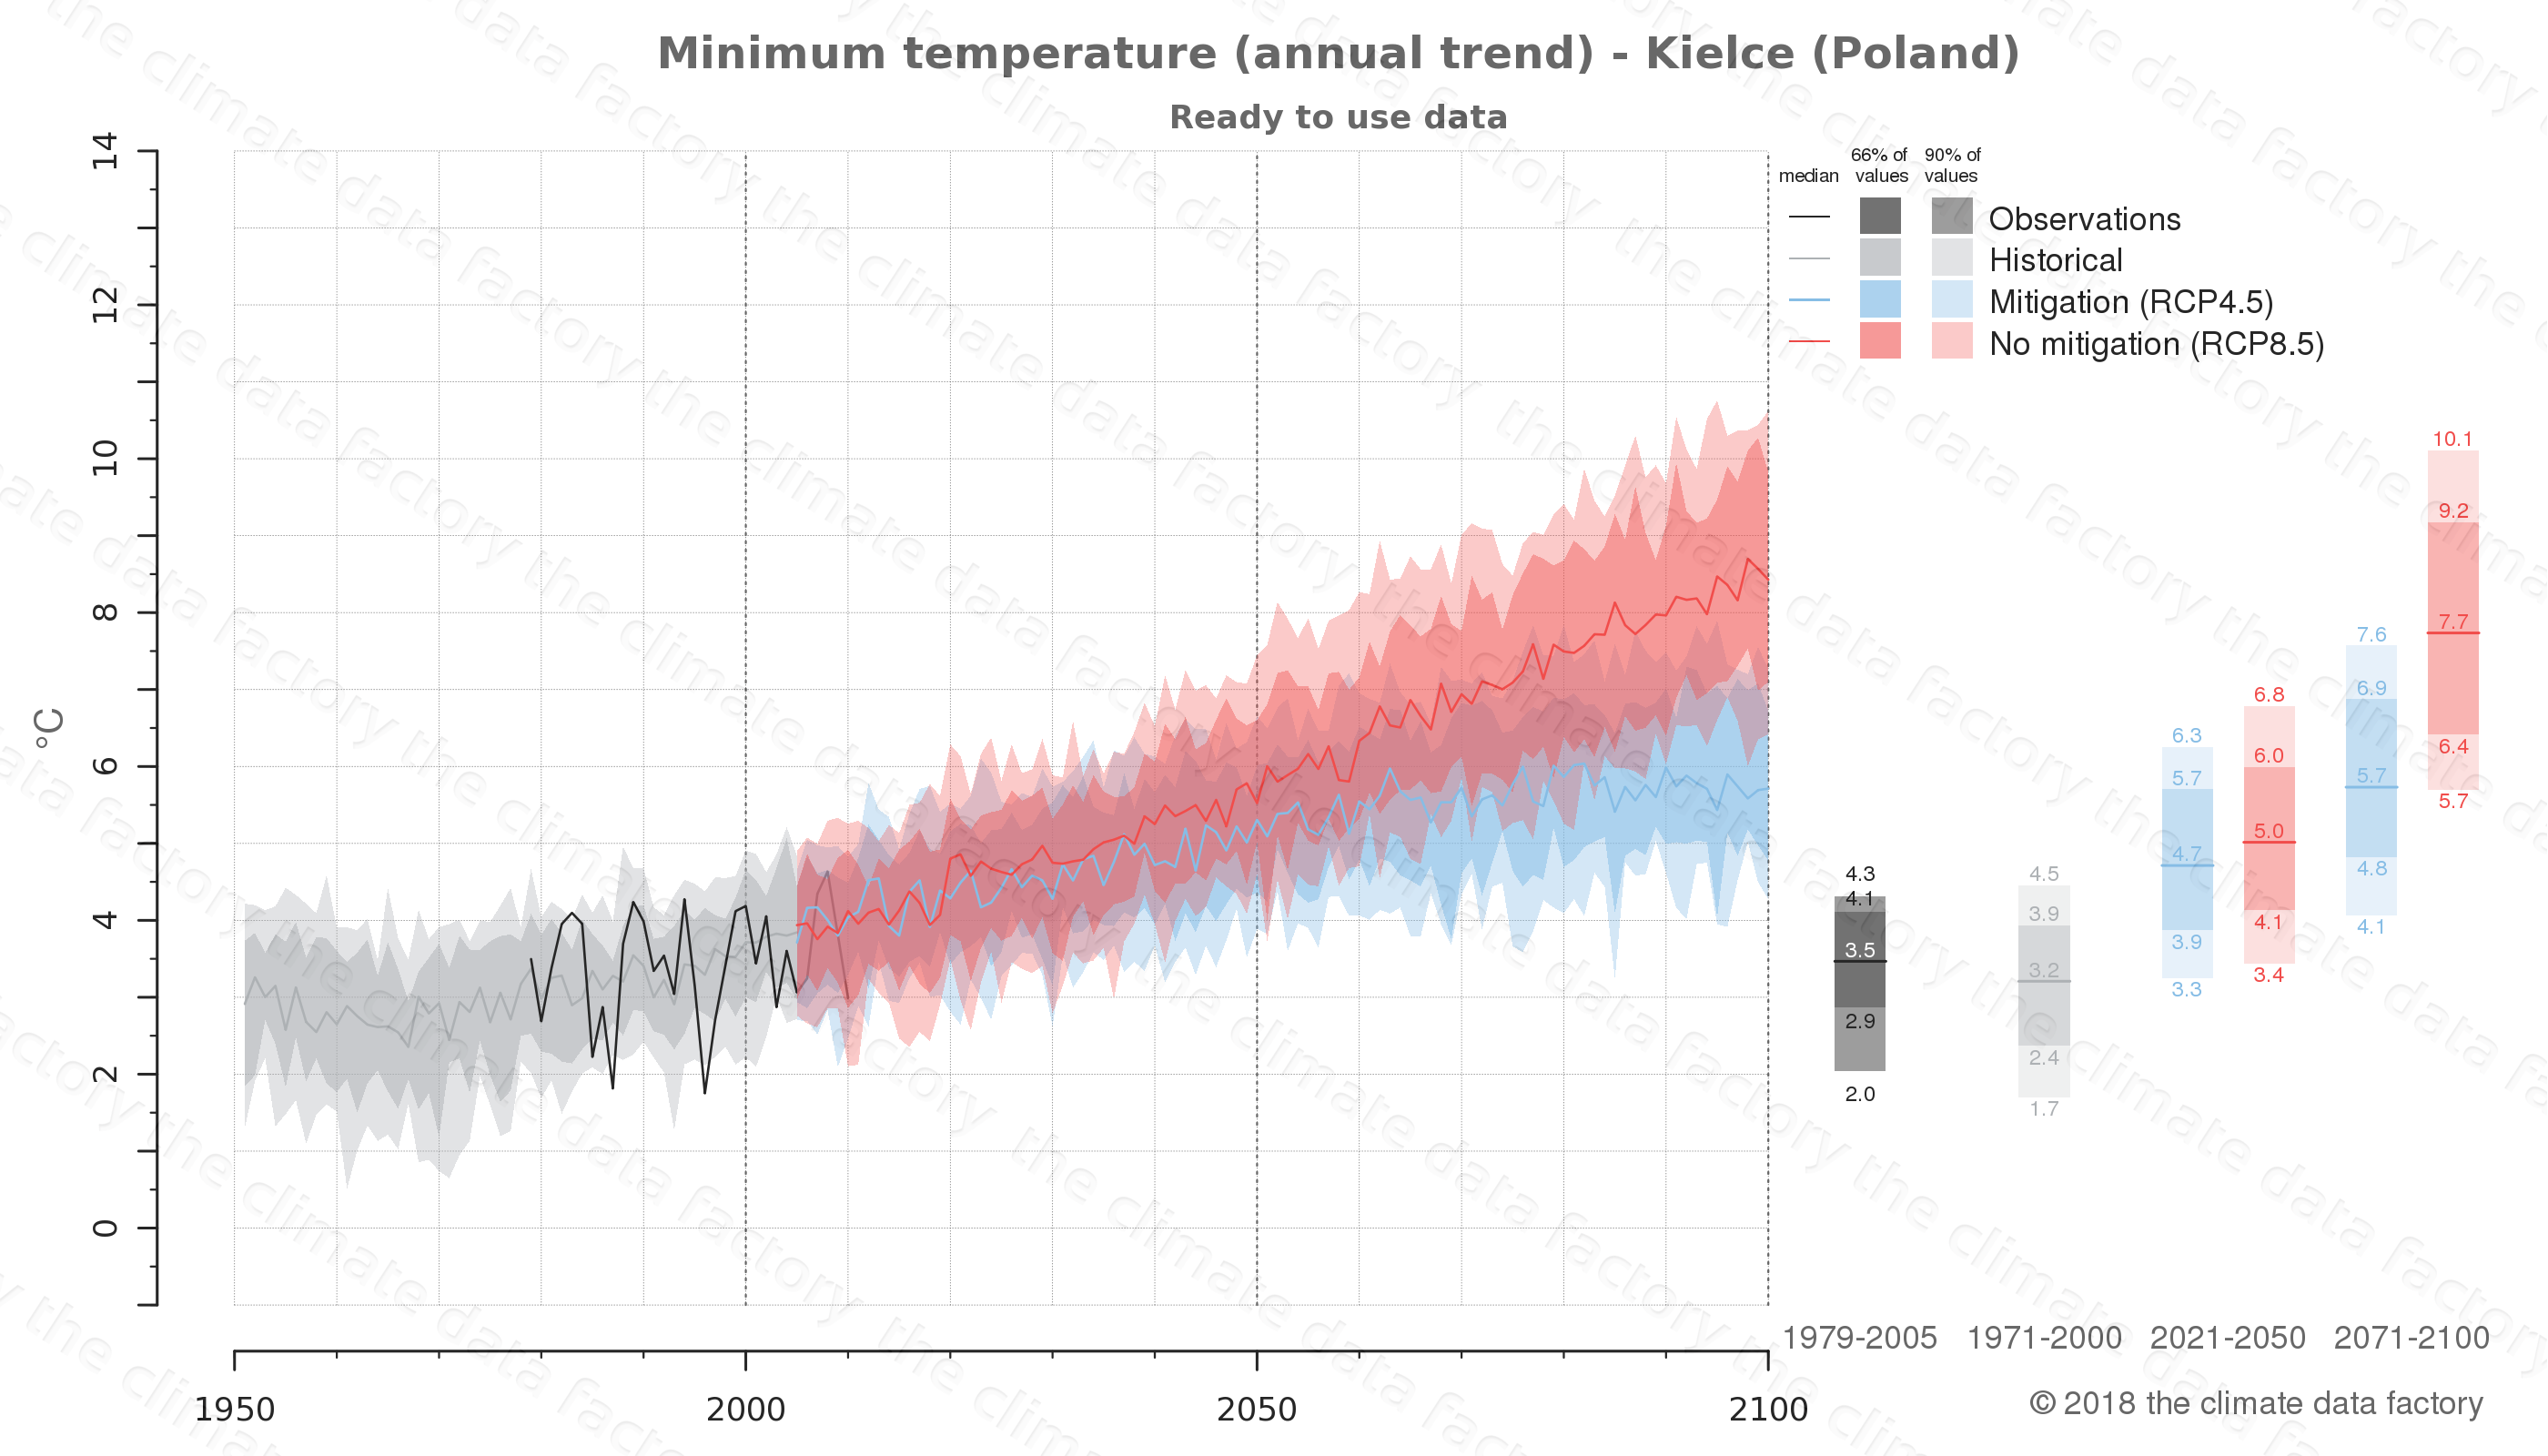 climate change data policy adaptation climate graph city data minimum-temperature kielce poland